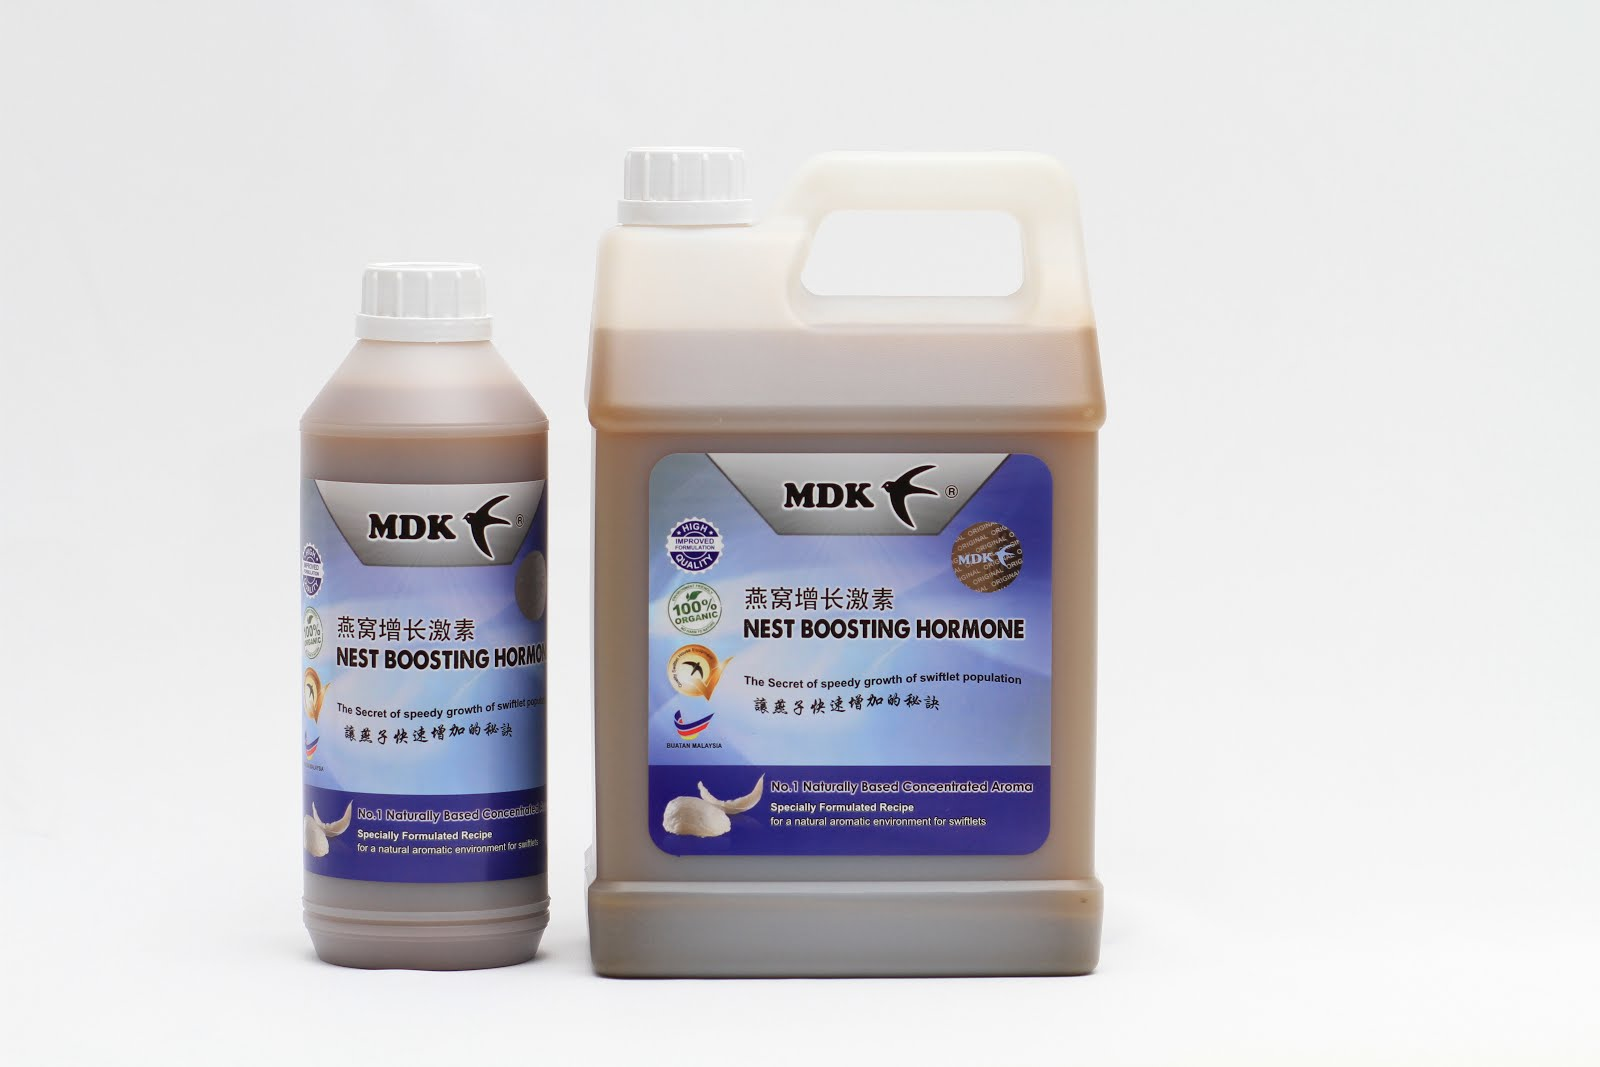 MDK Nest Boosting Hormone